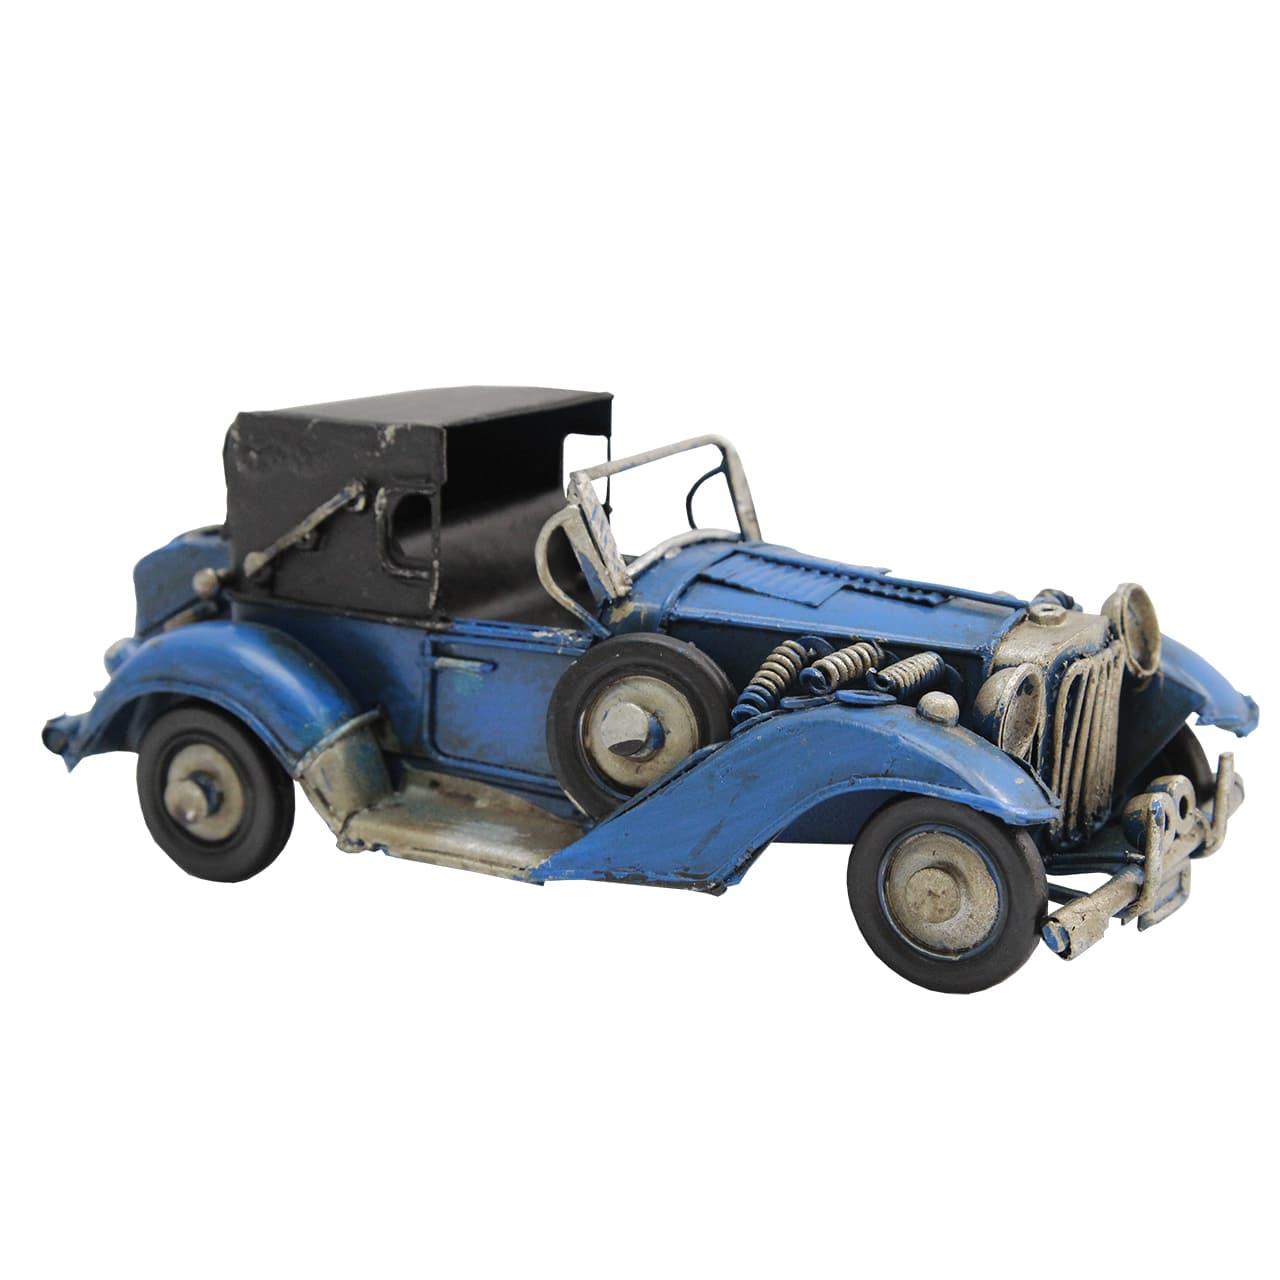 Macheta Masina De Epoca Din Metal Albastru 16x8x6 Cm